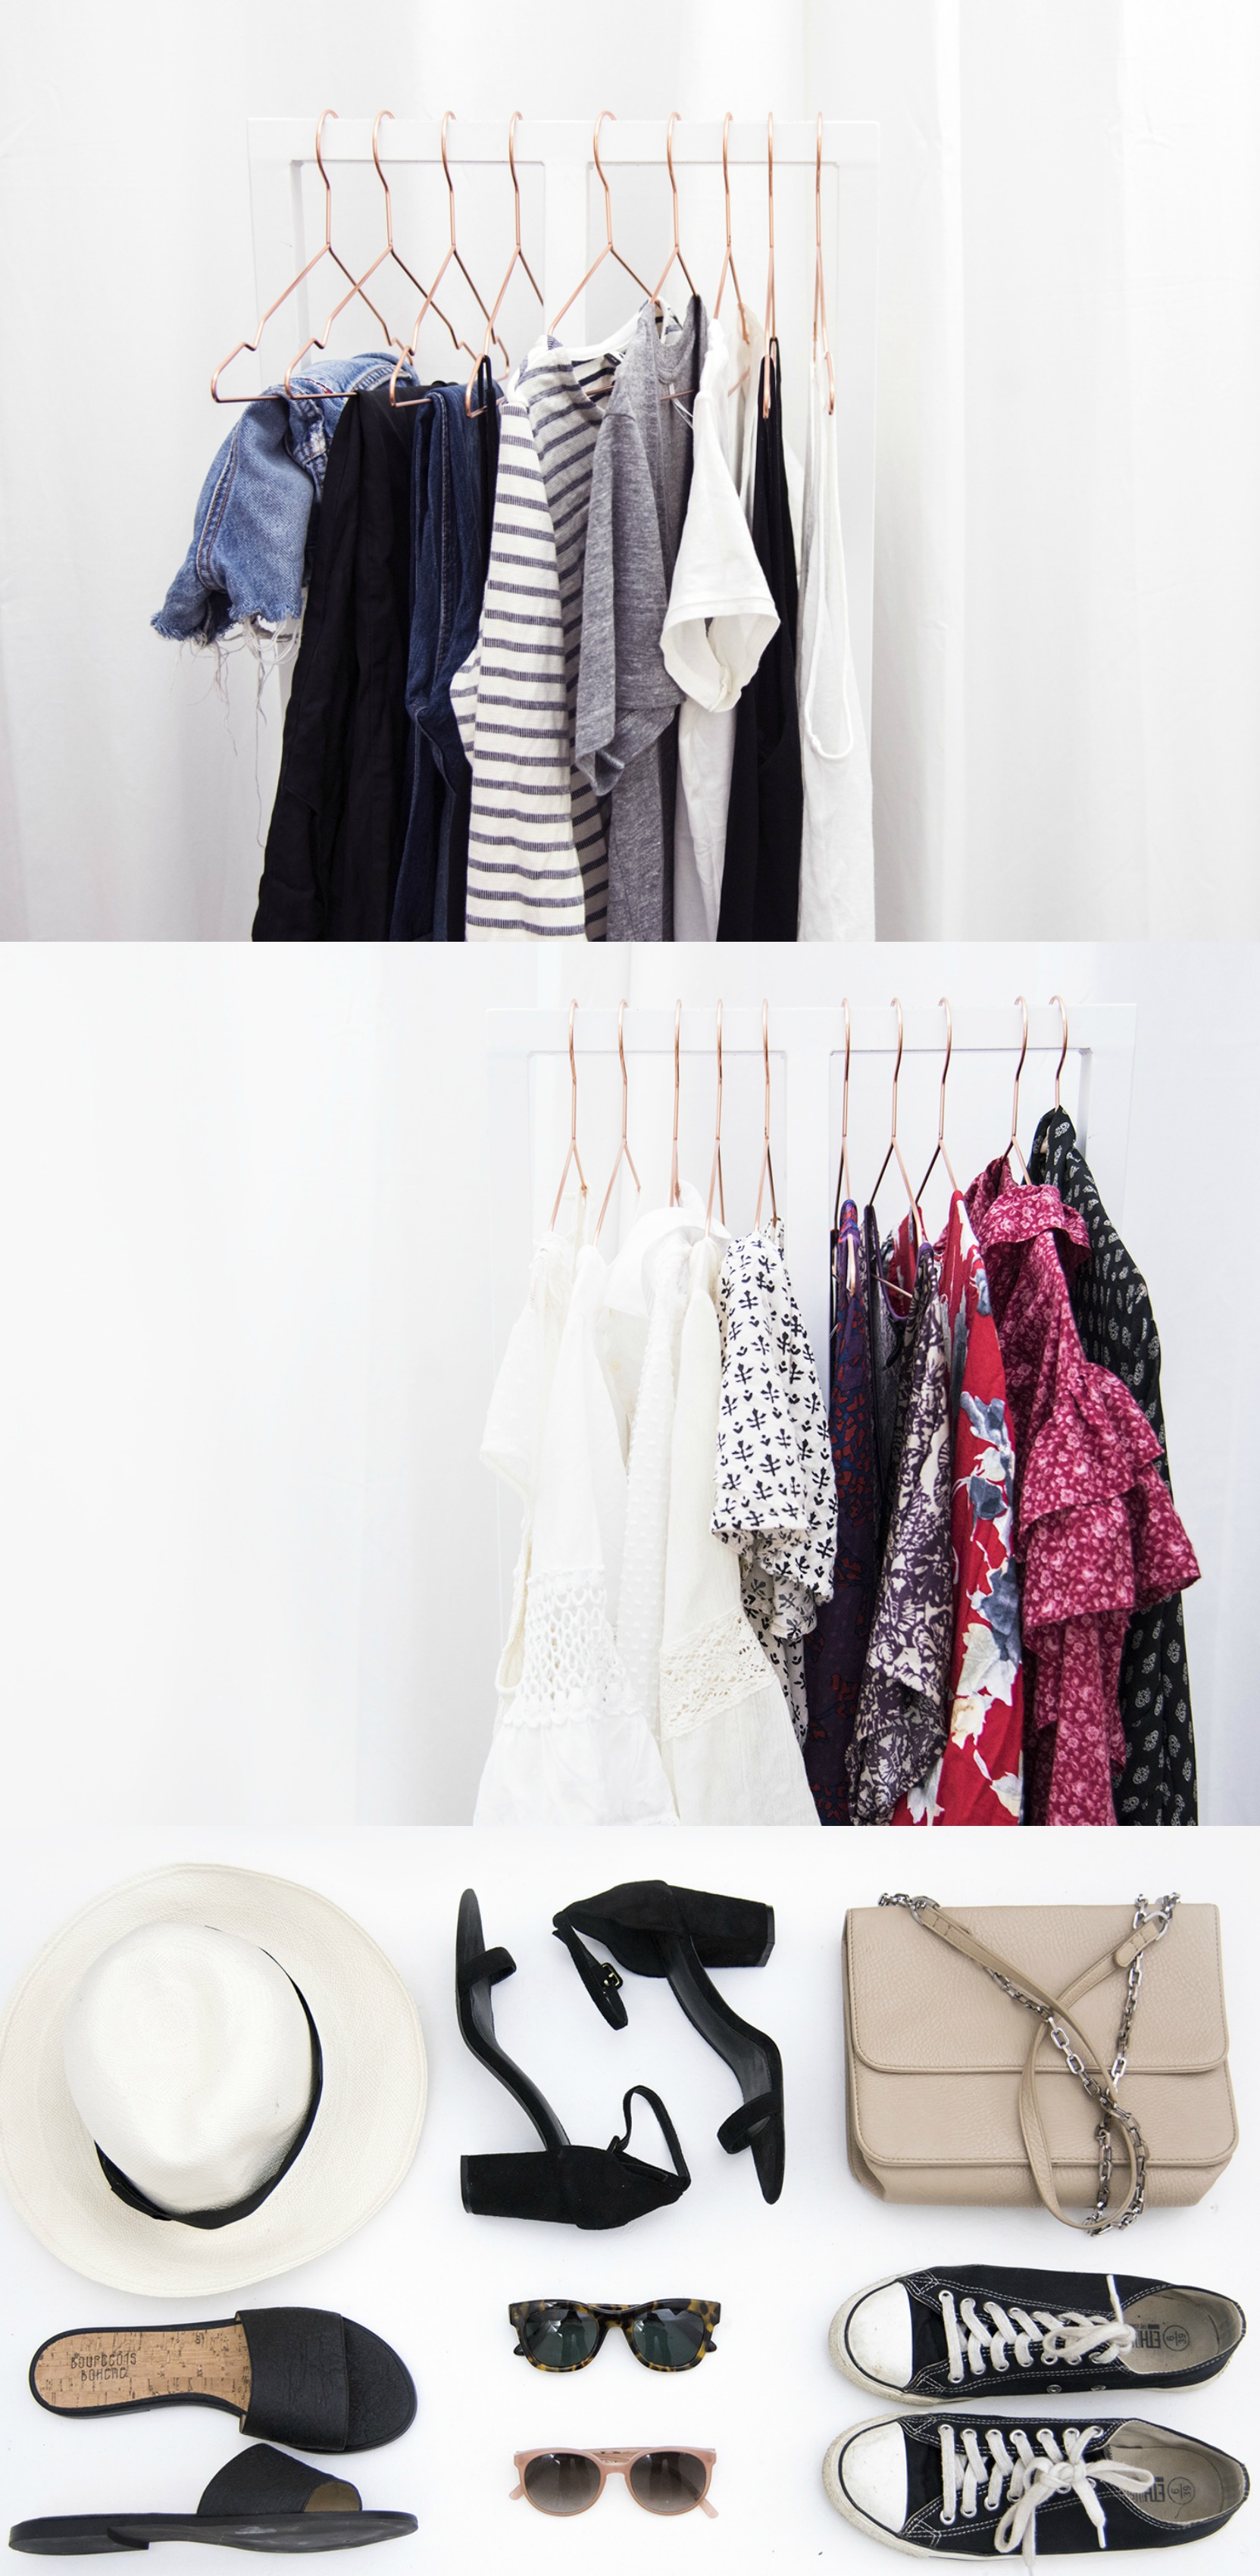 Video: Fair Fashion Capsule Wardrobe Part I-III